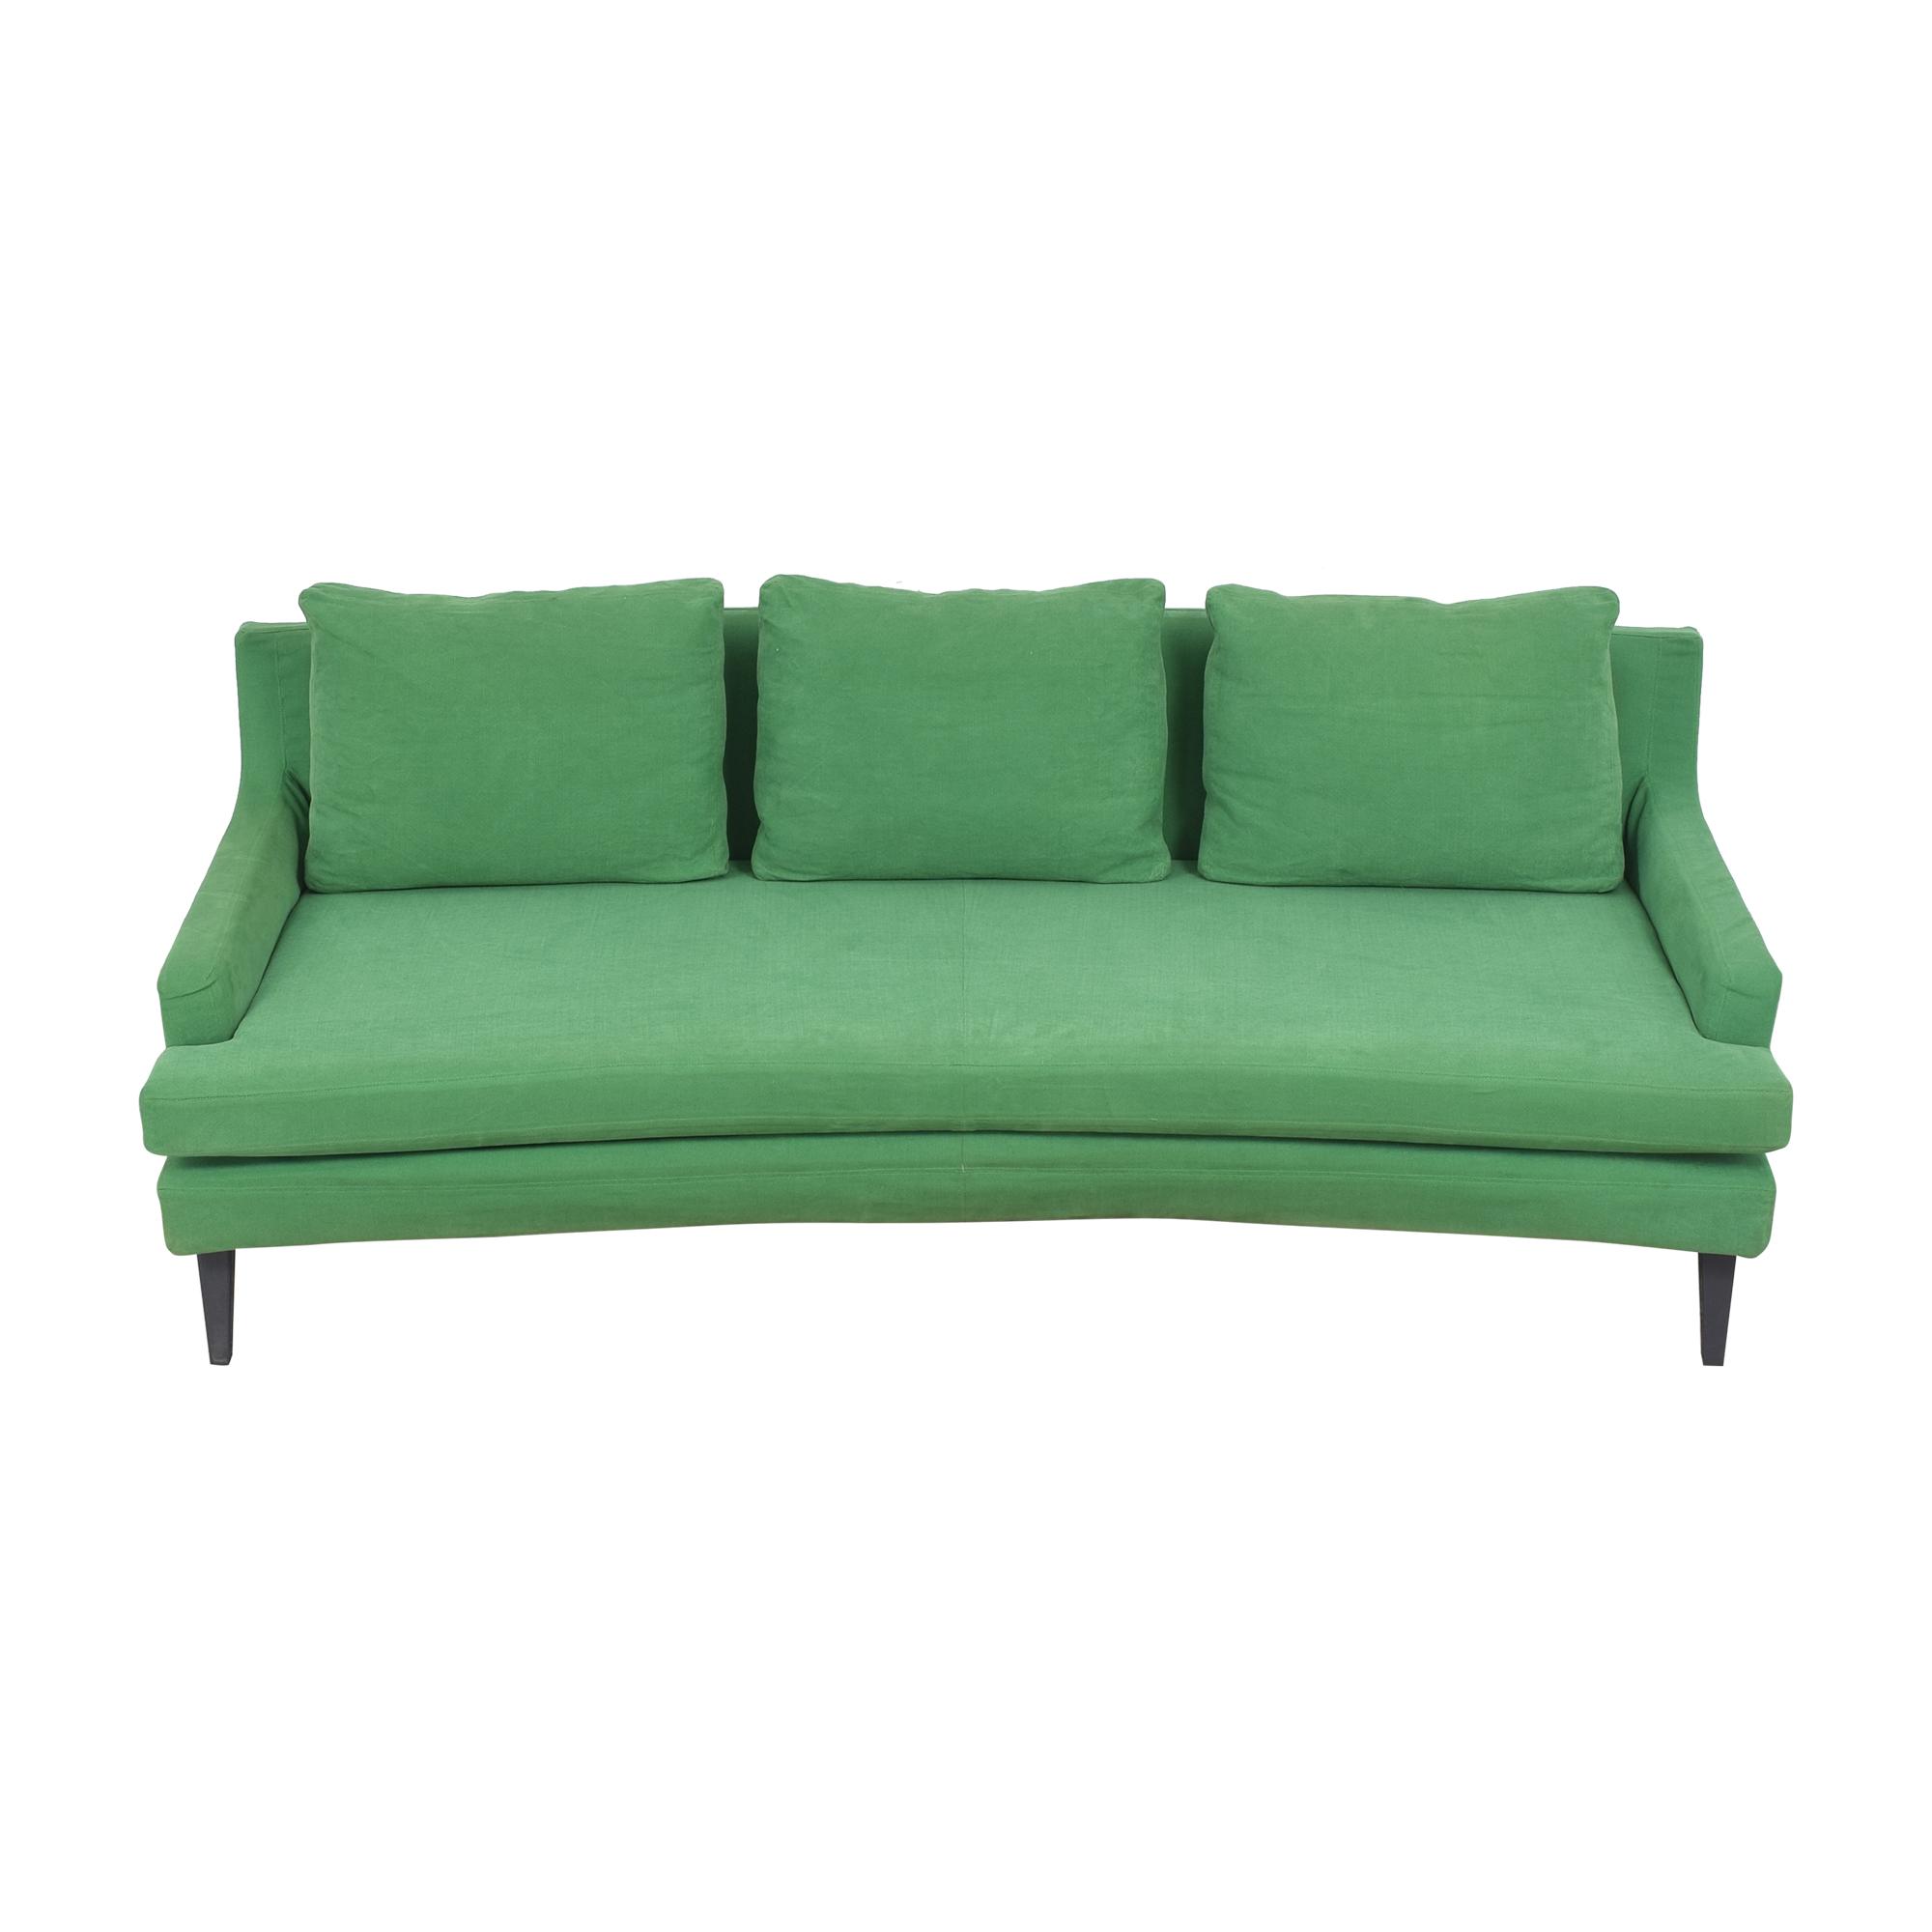 Ligne Roset Ligne Roset Belem Bench Cushion Sofa on sale